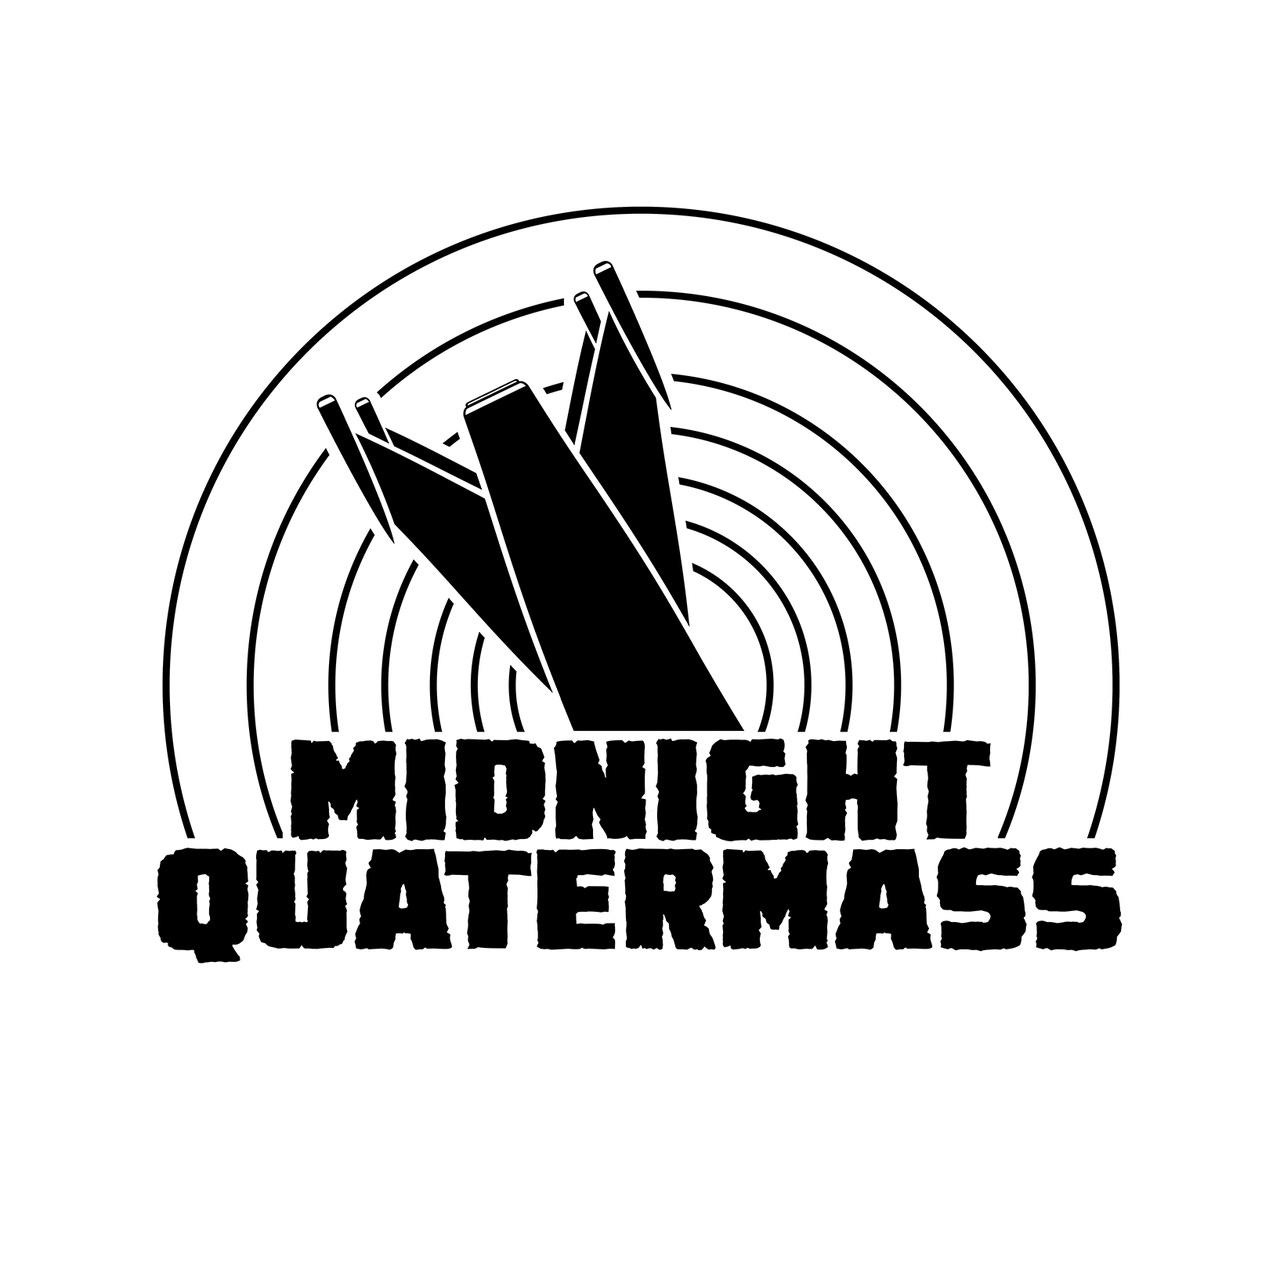 Midnight Quatermass